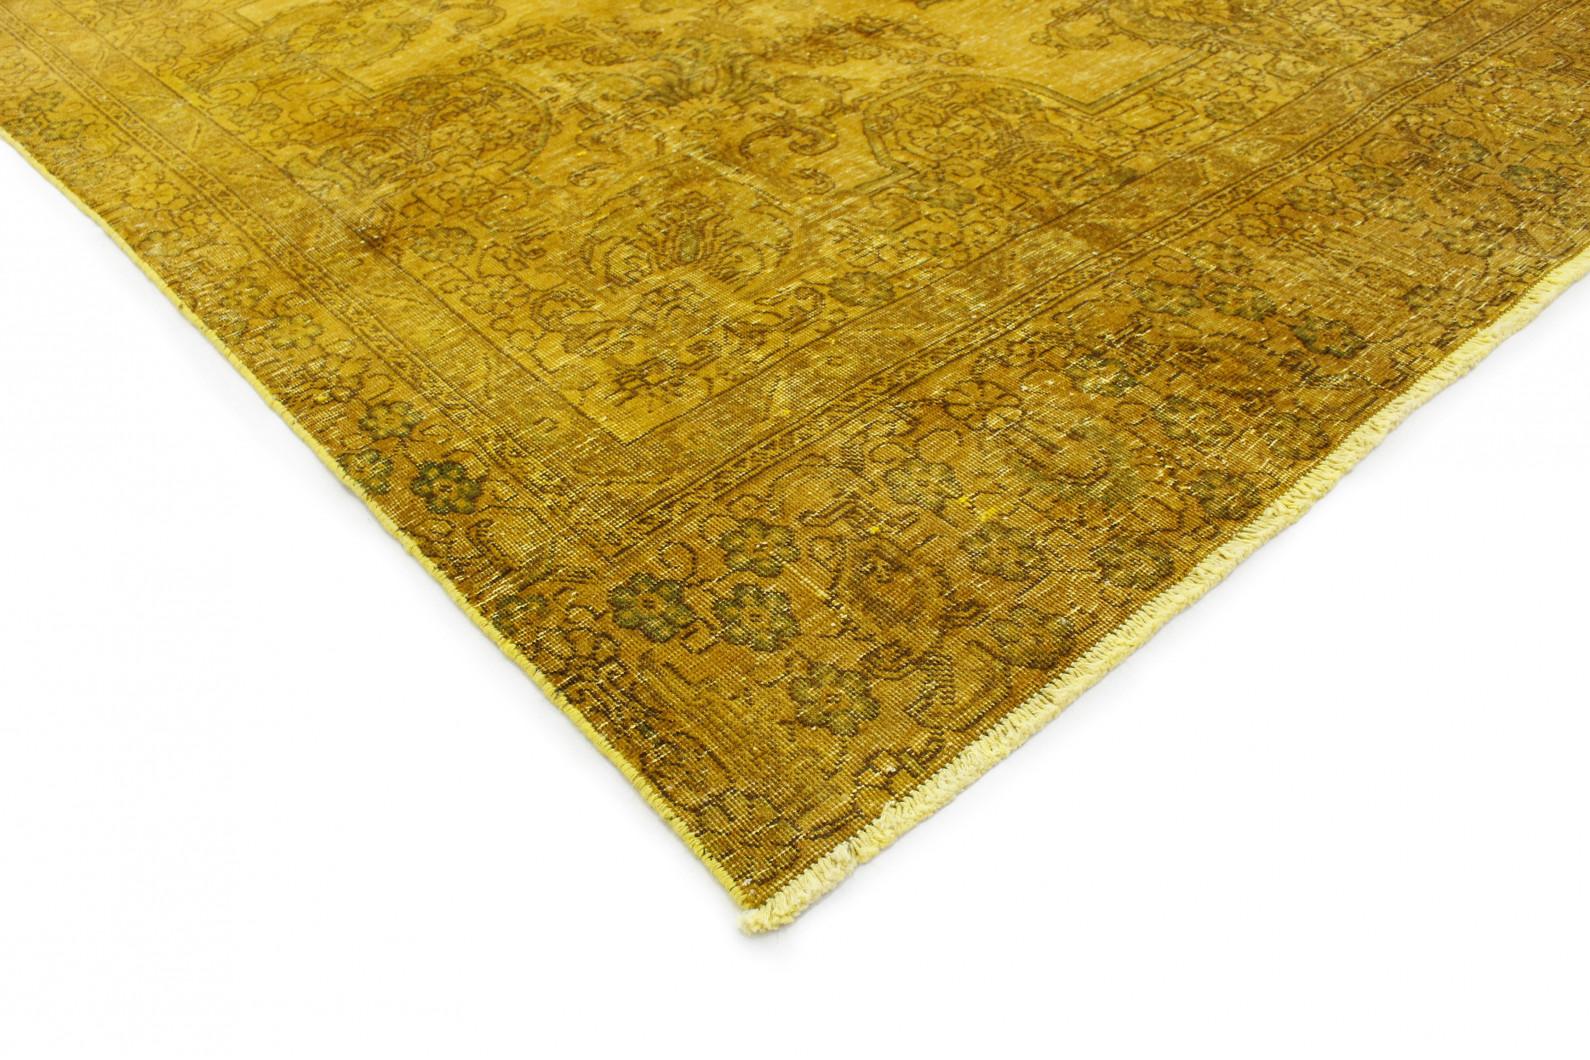 vintage teppich gold in 410x260 1001 167247 bei. Black Bedroom Furniture Sets. Home Design Ideas